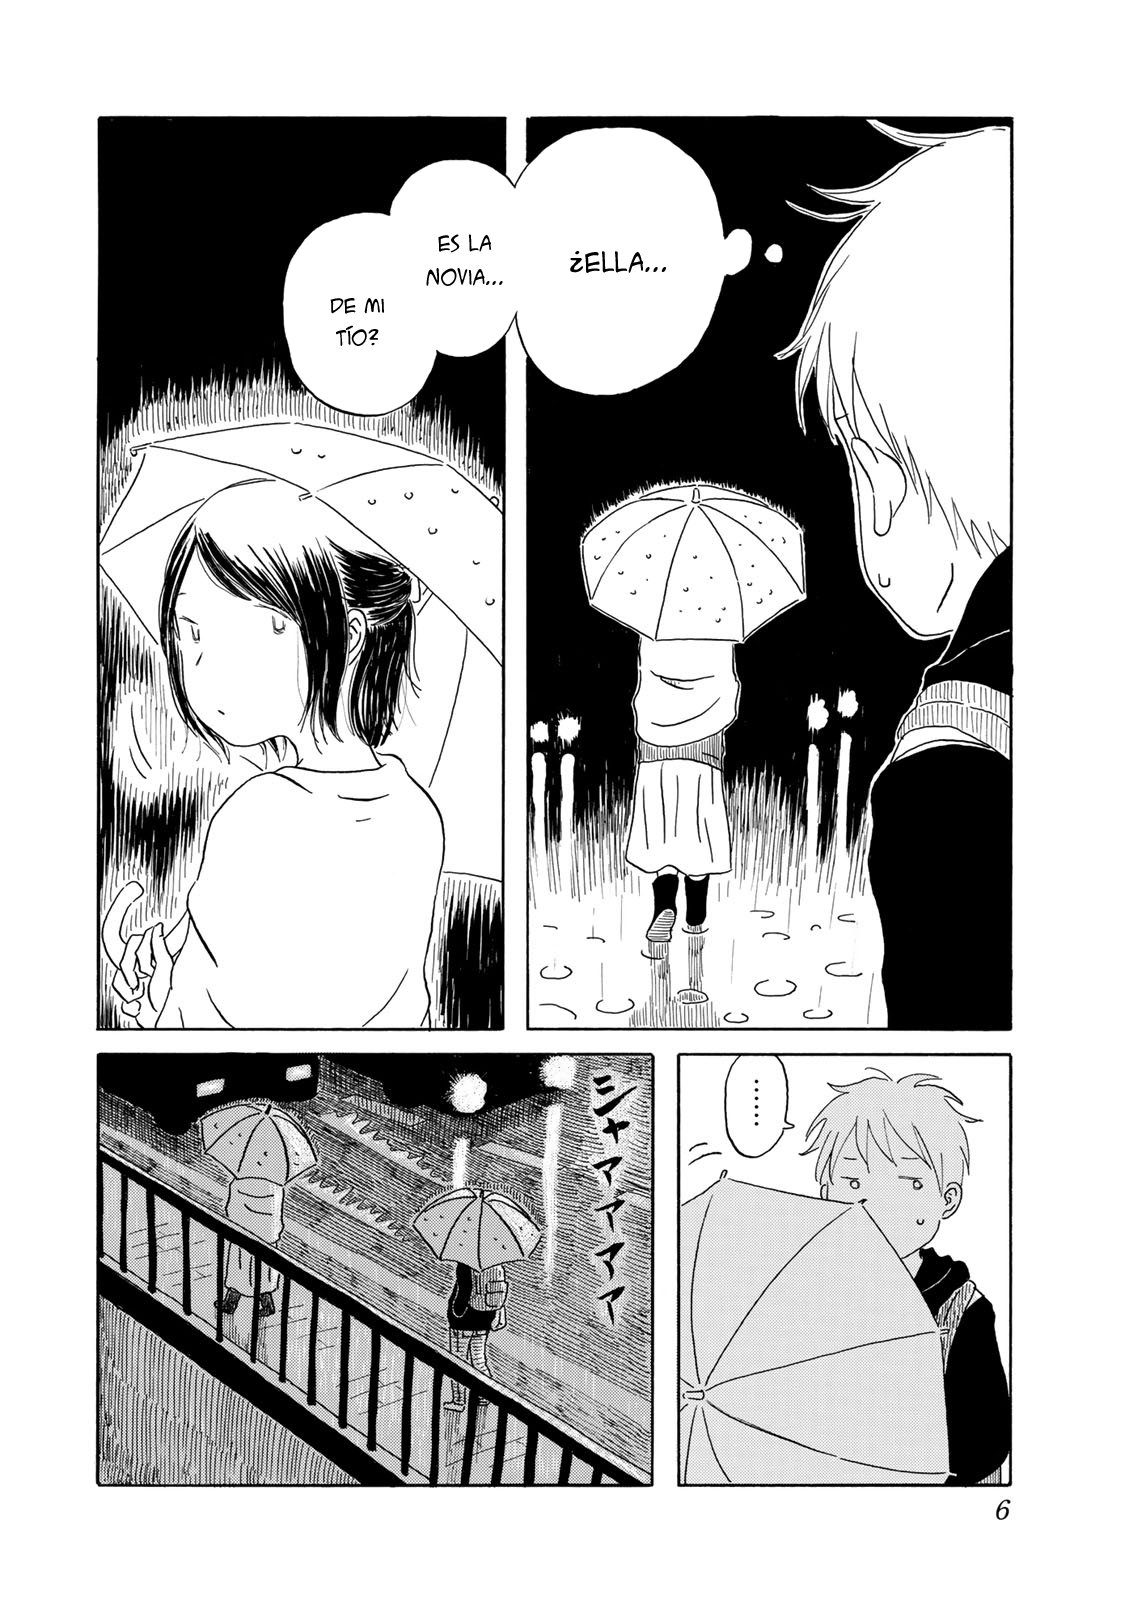 https://nine.mangadogs.com/es_manga/pic8/50/36658/946317/d30cca09053fc7dffbf5576cde094c45.jpg Page 7